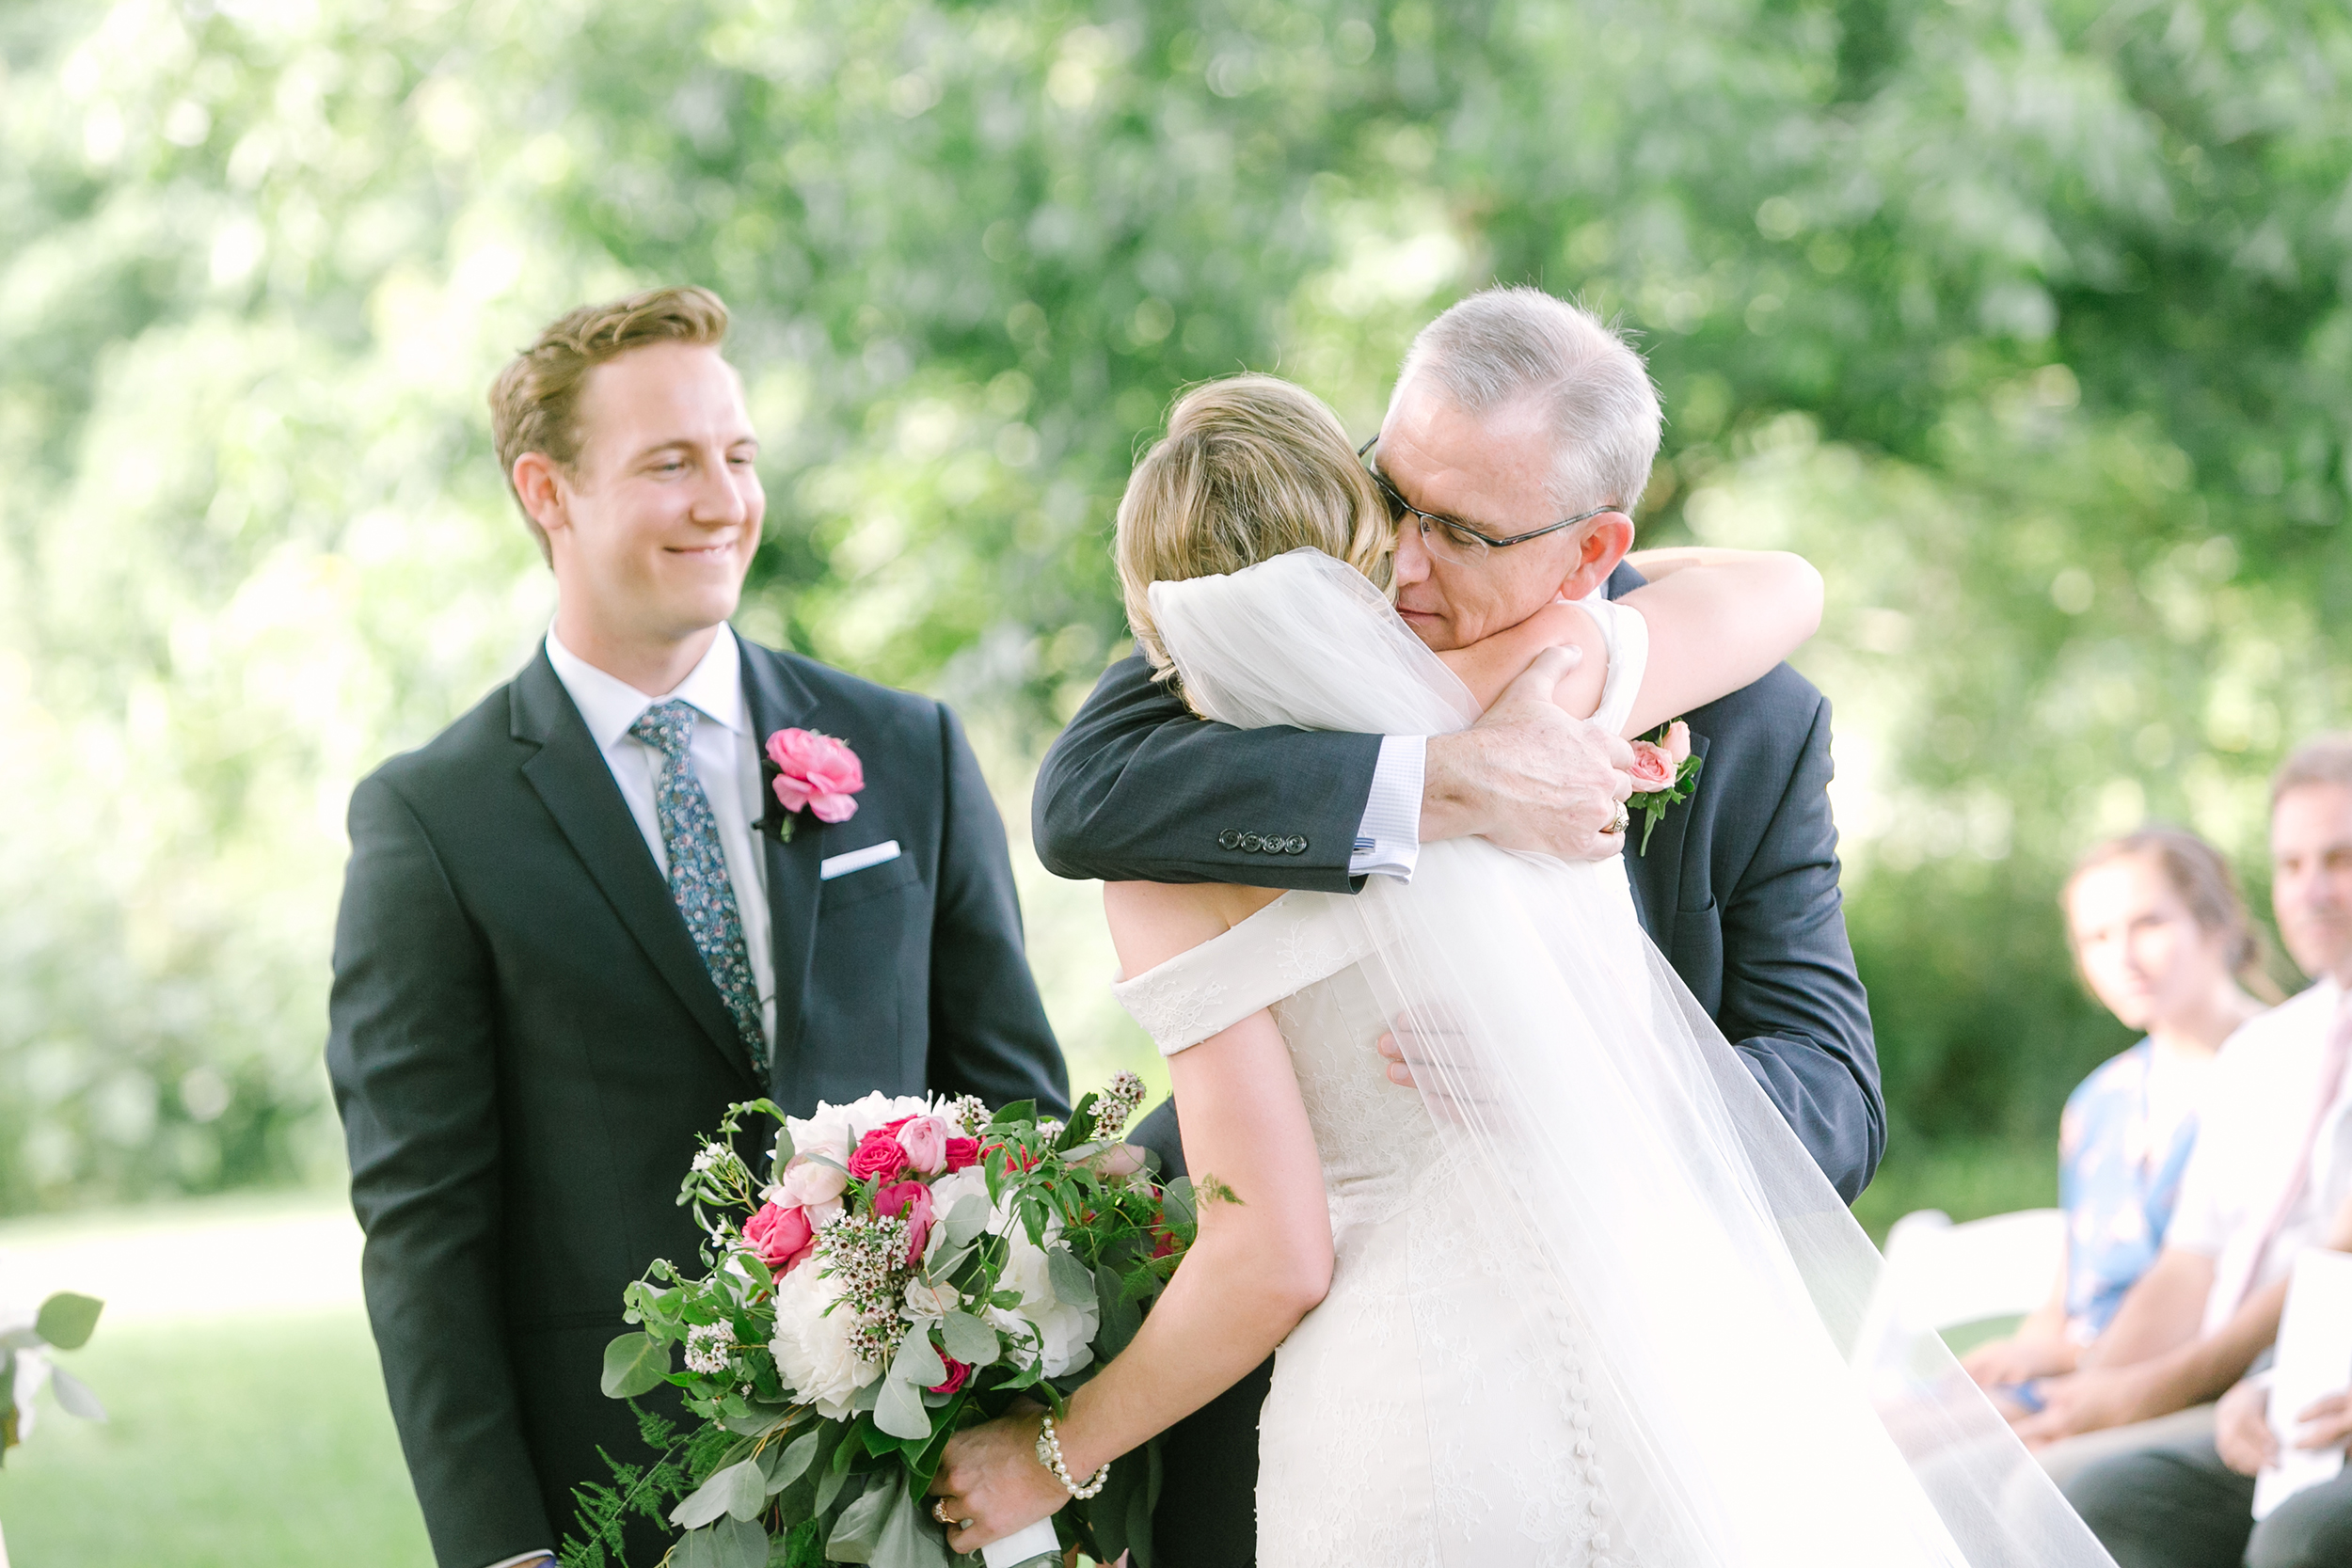 Austin_Wedding_Photographer_Kimberly_Brooke_Photographic_120.jpg